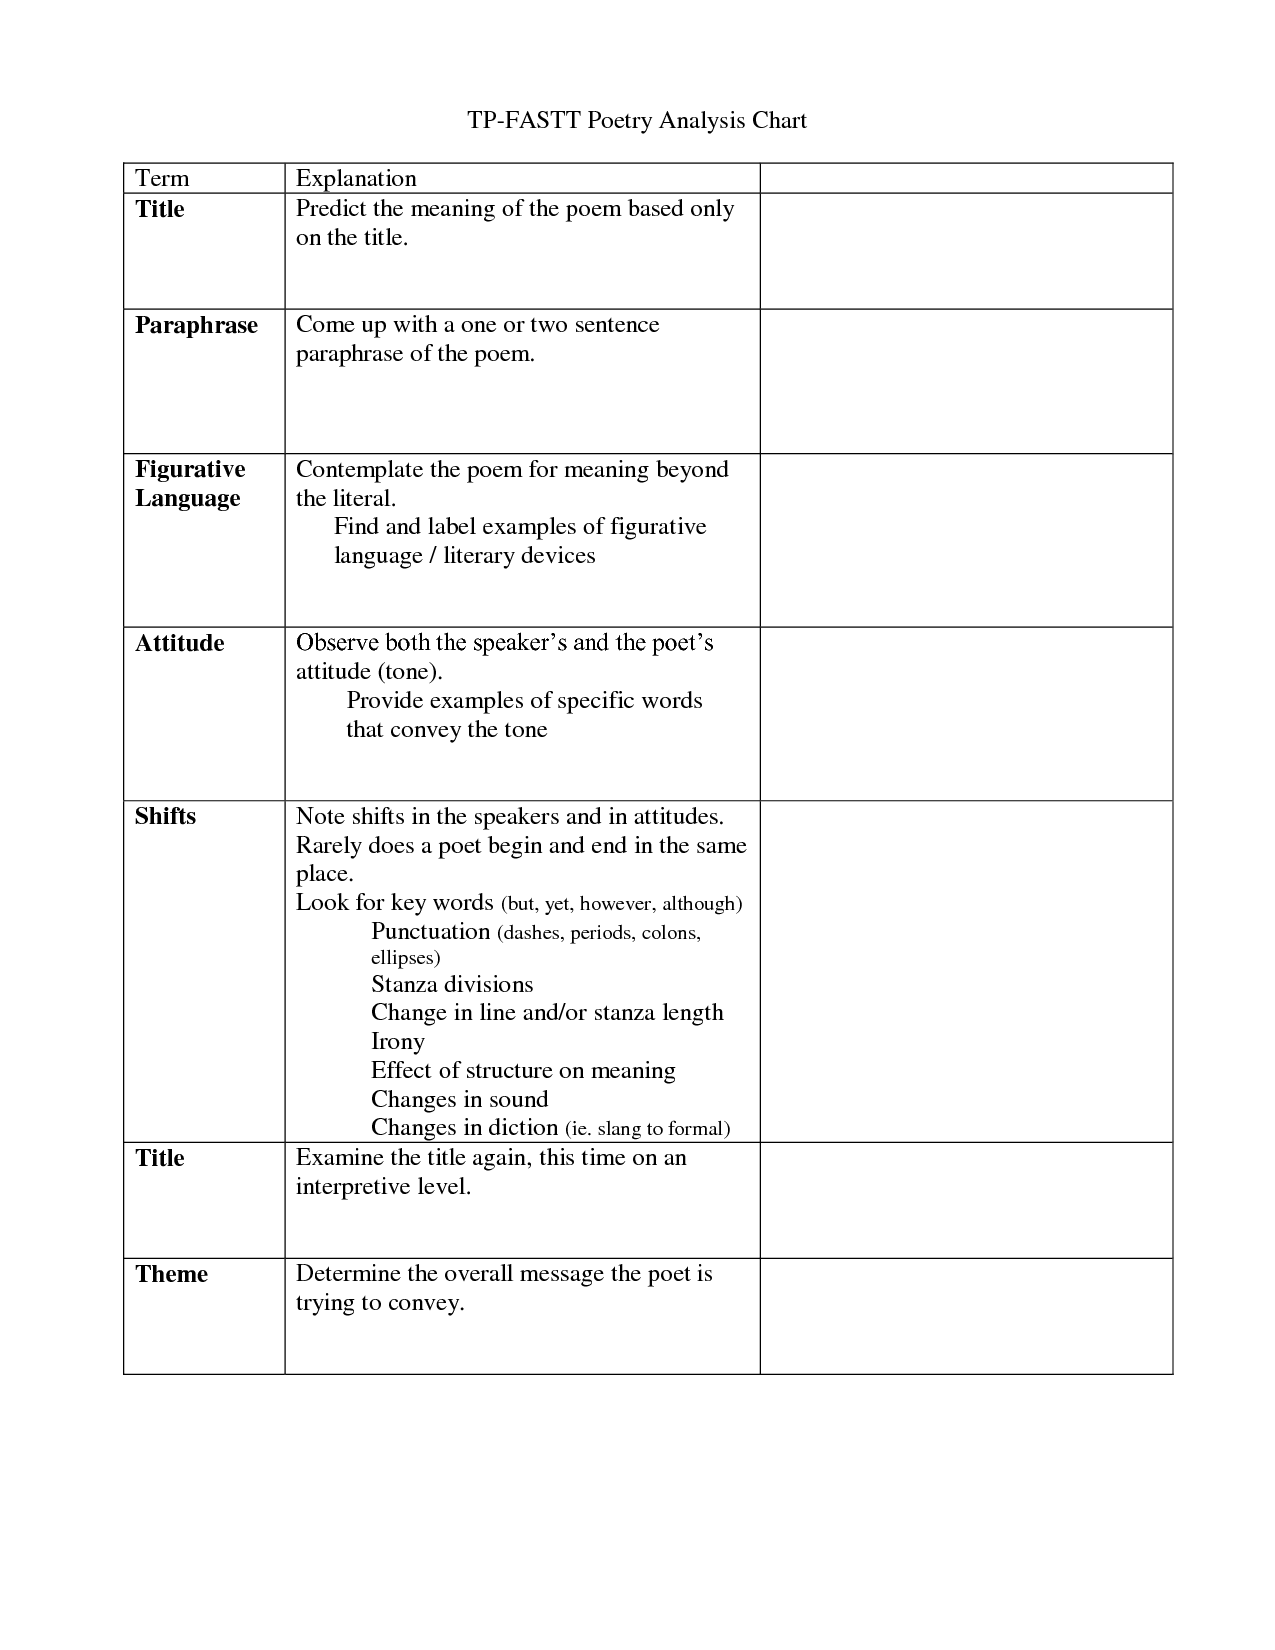 A Poetryysis Chart